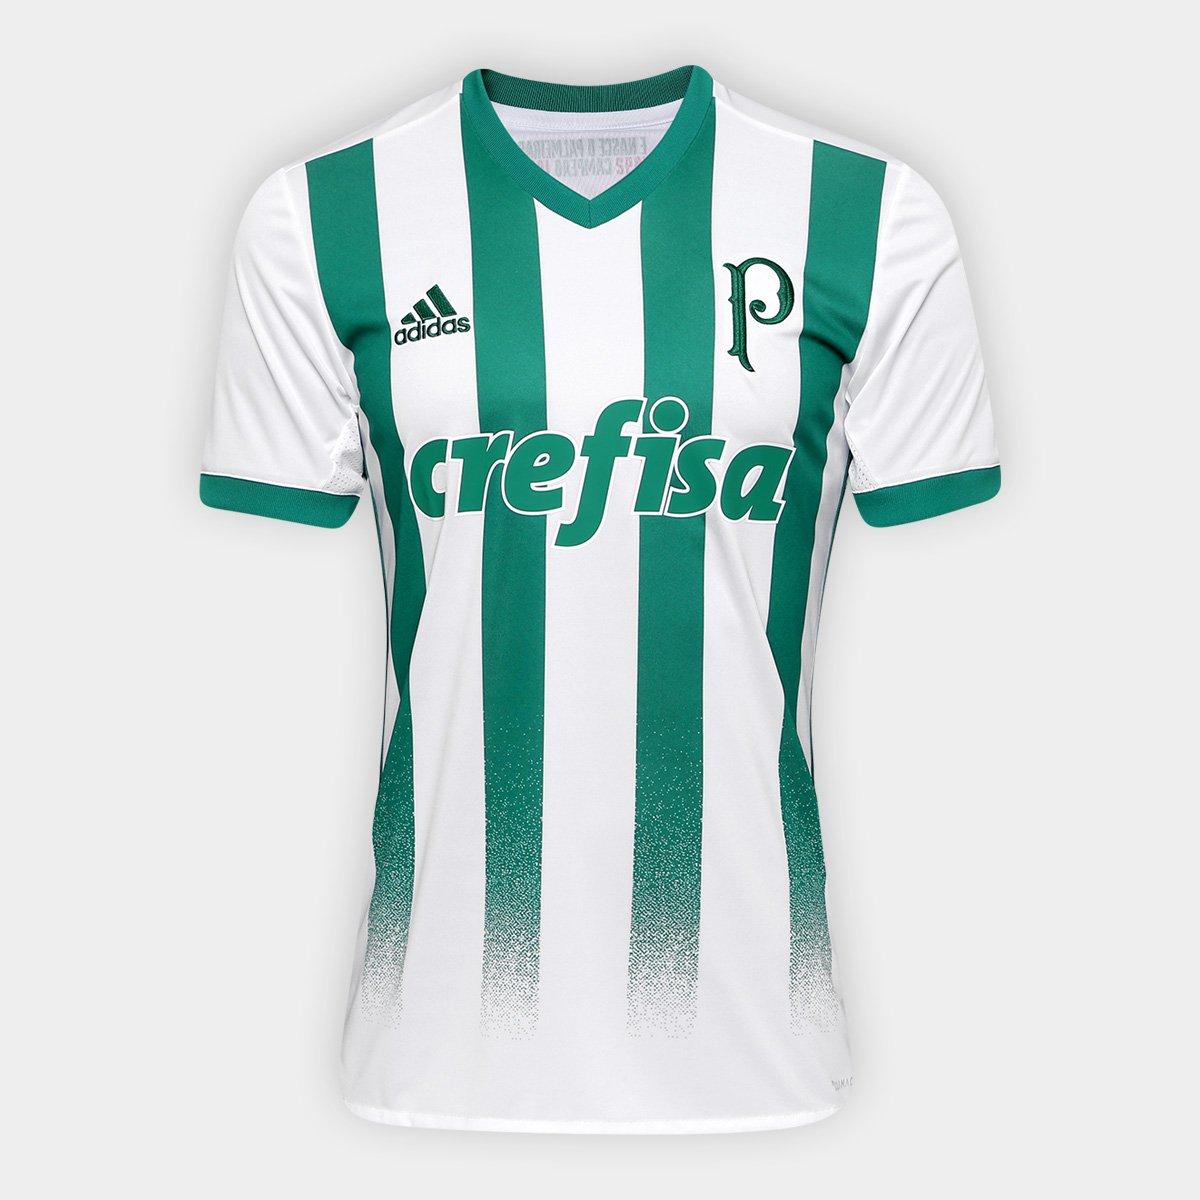 63a3267e1 Camisa Palmeiras II 17/18 s/nº Torcedor Adidas Masculina | Allianz Parque  Shop